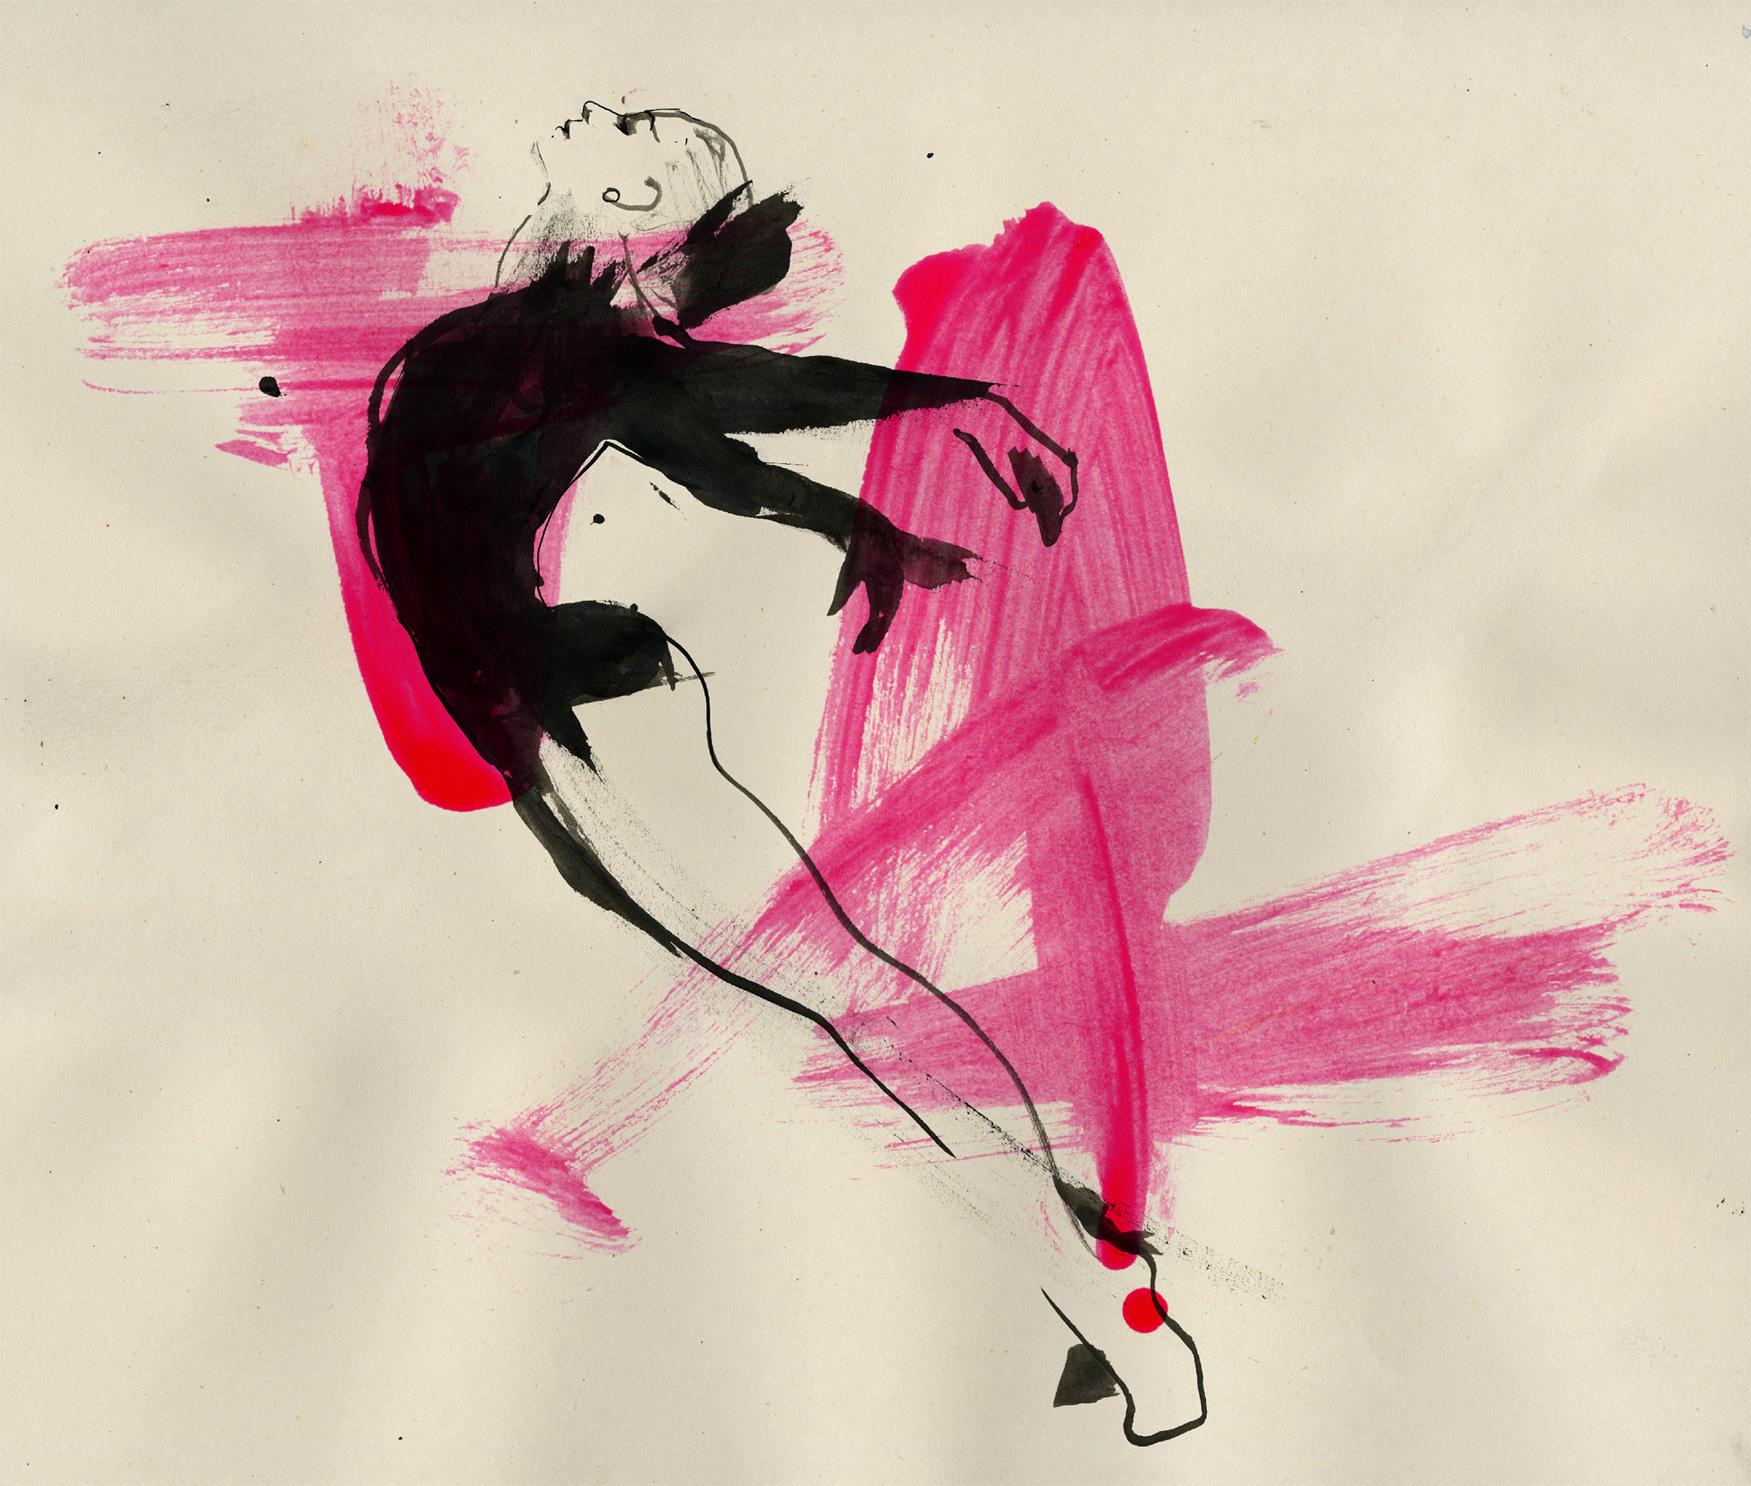 stina-persson-ink-moce-dance-wear-ballet.jpg